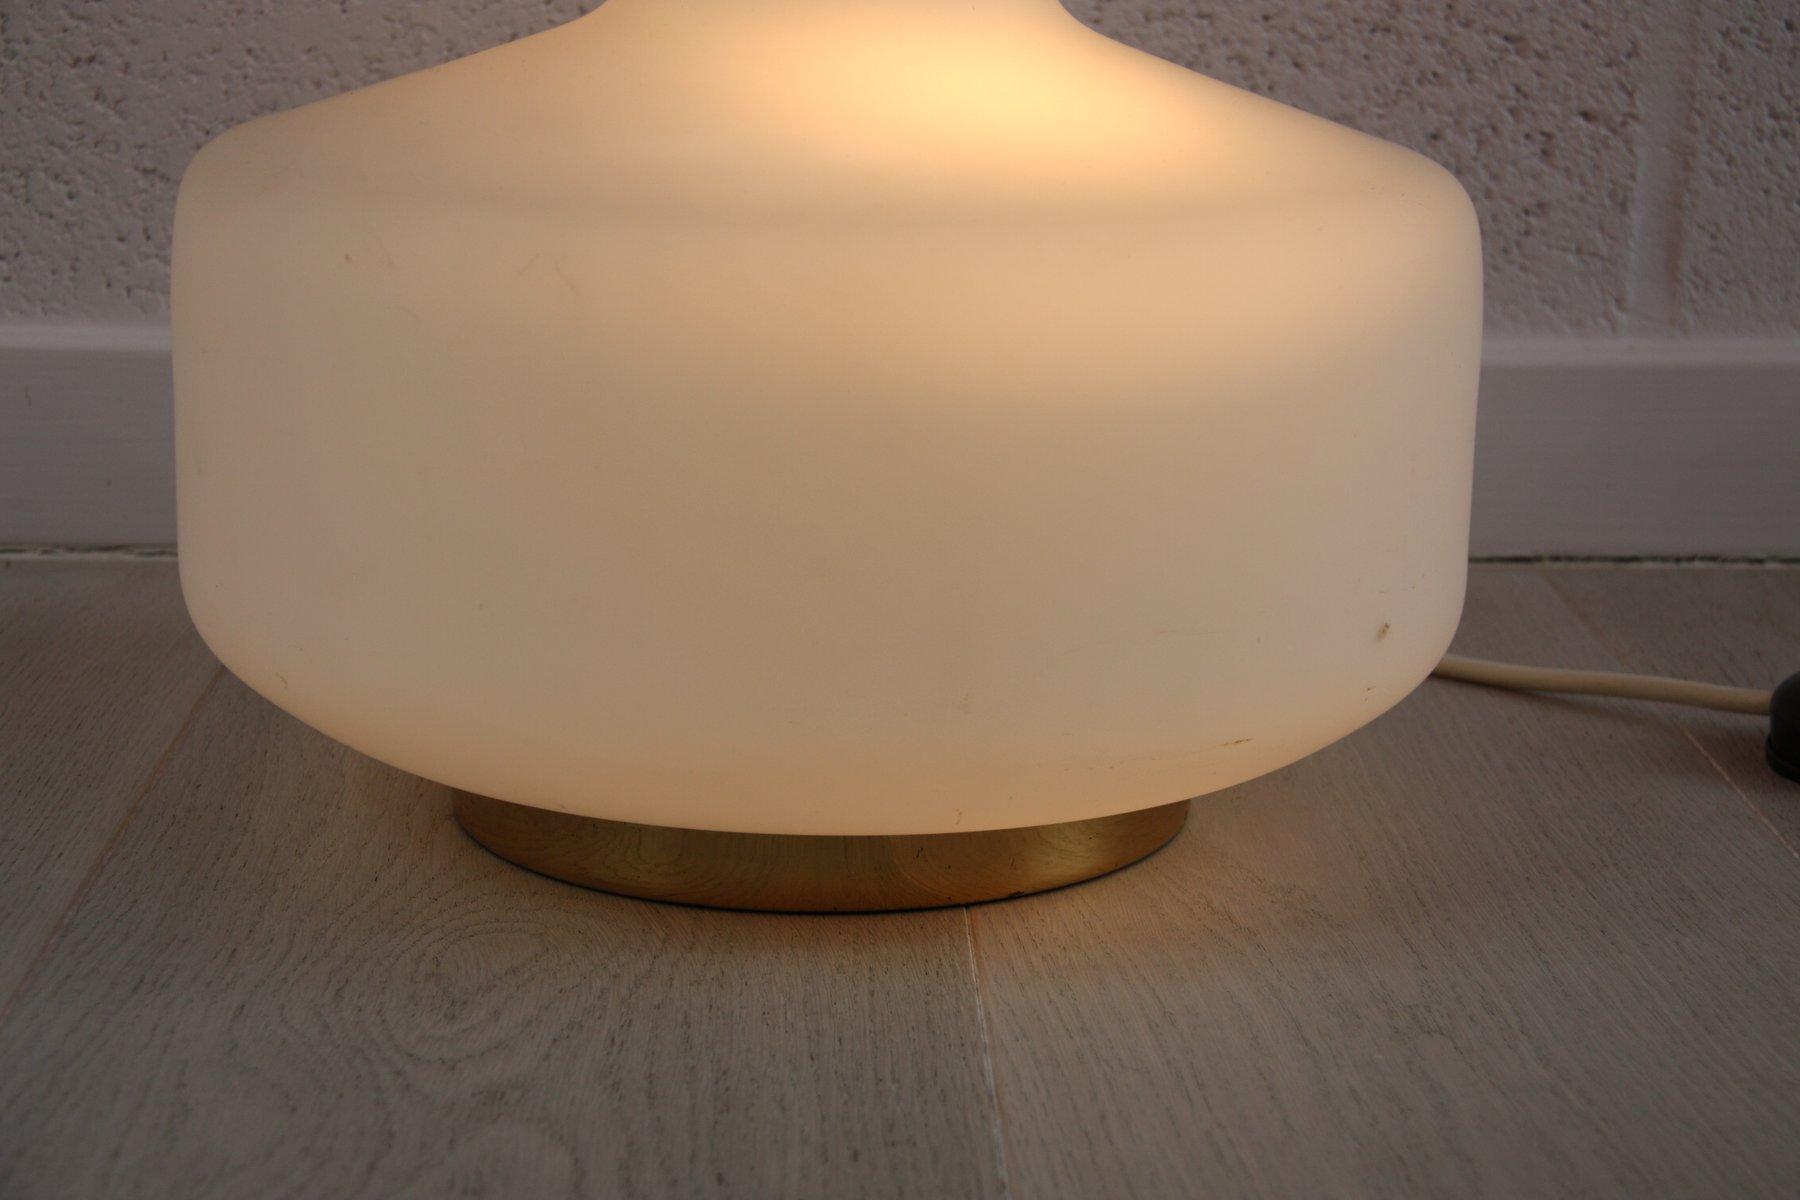 stehlampe mit groem schirm fabulous fazit flexible. Black Bedroom Furniture Sets. Home Design Ideas